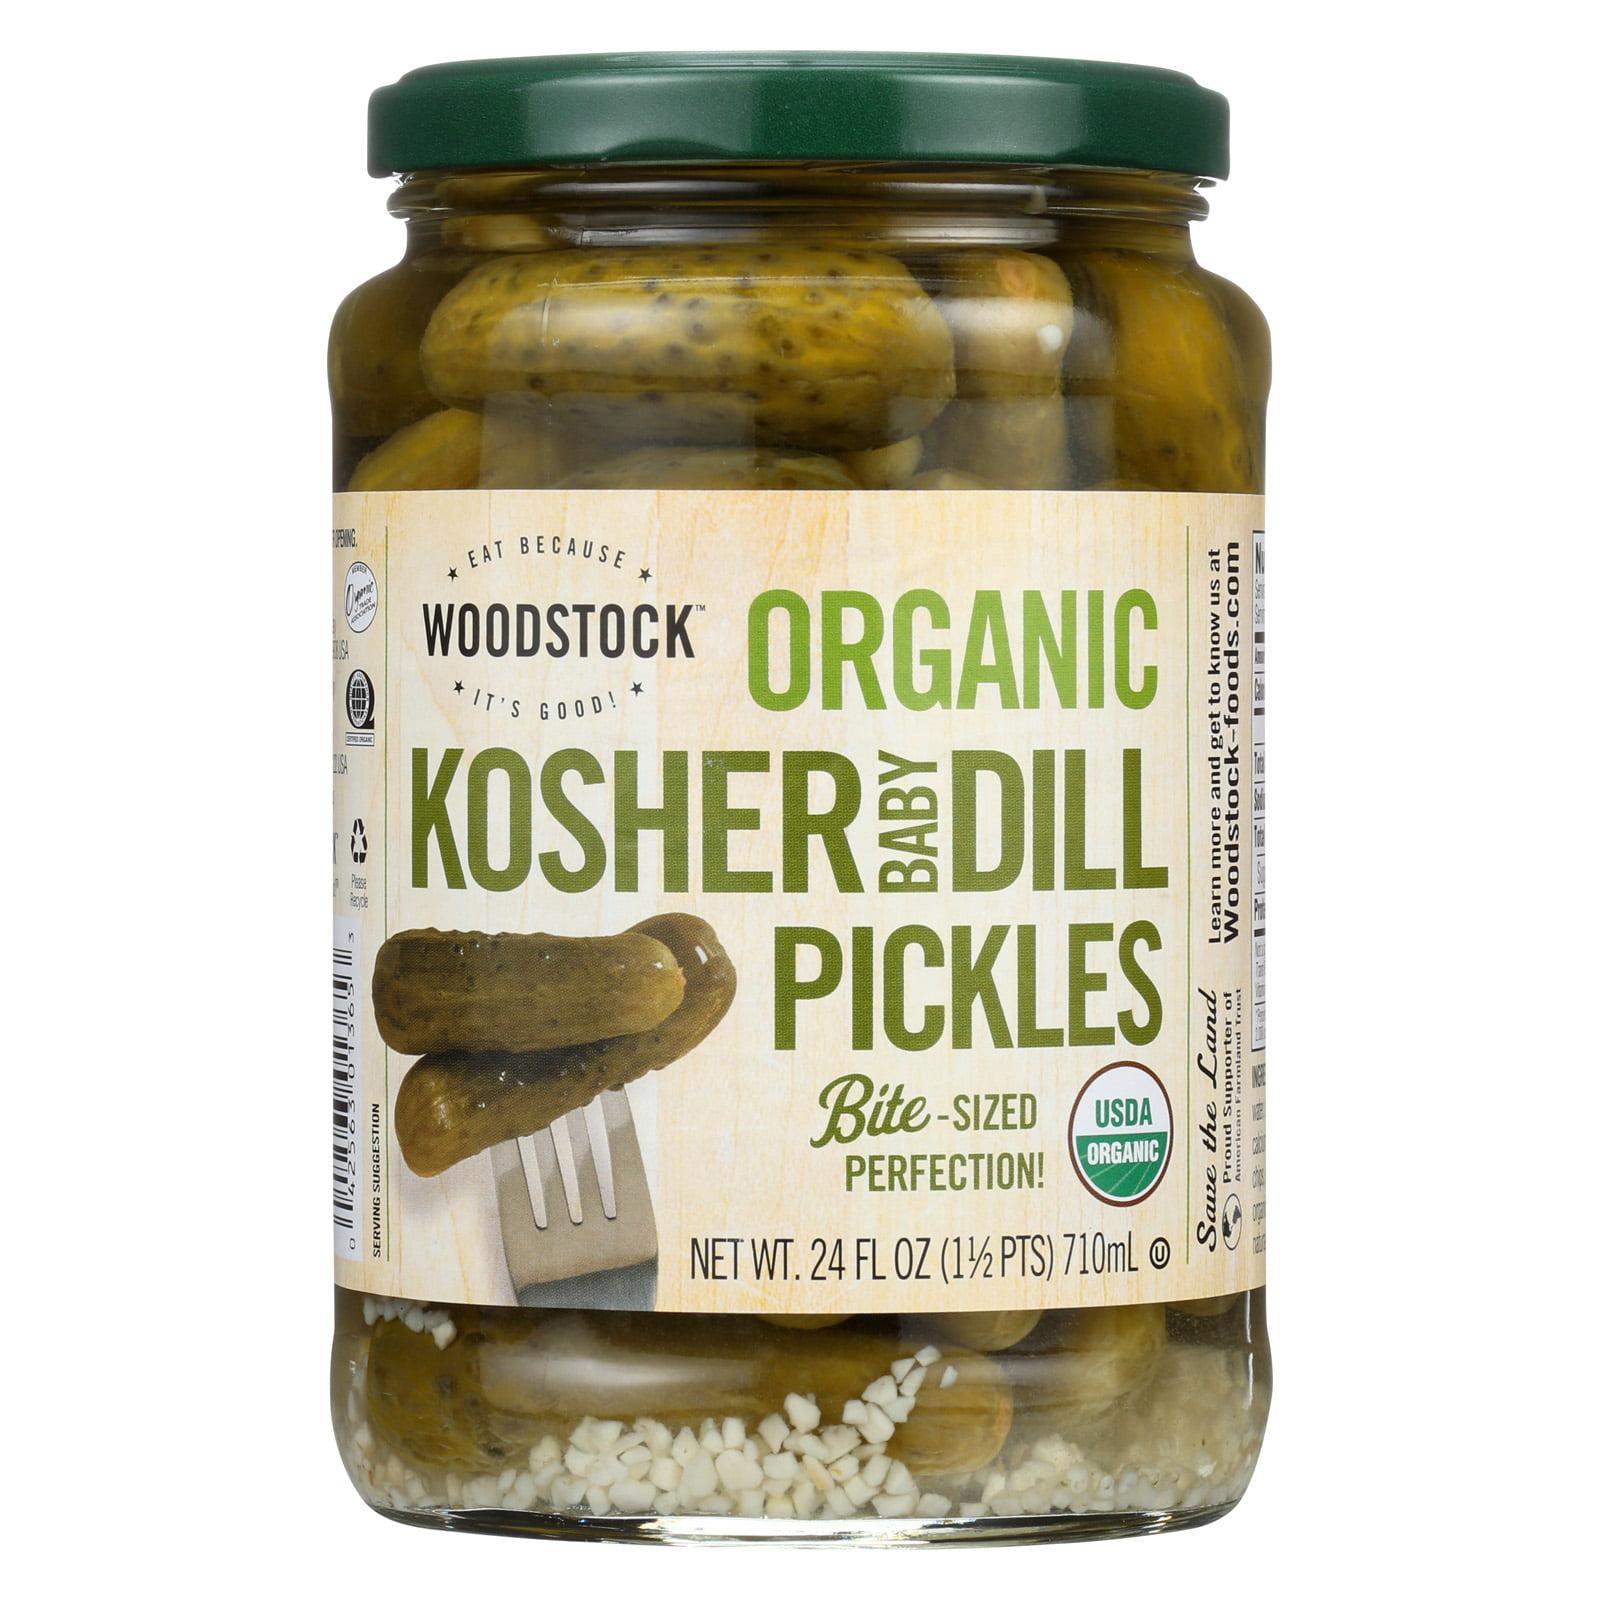 Woodstock Organic Kosher Baby Dill Pickles - Case of 6 - ...